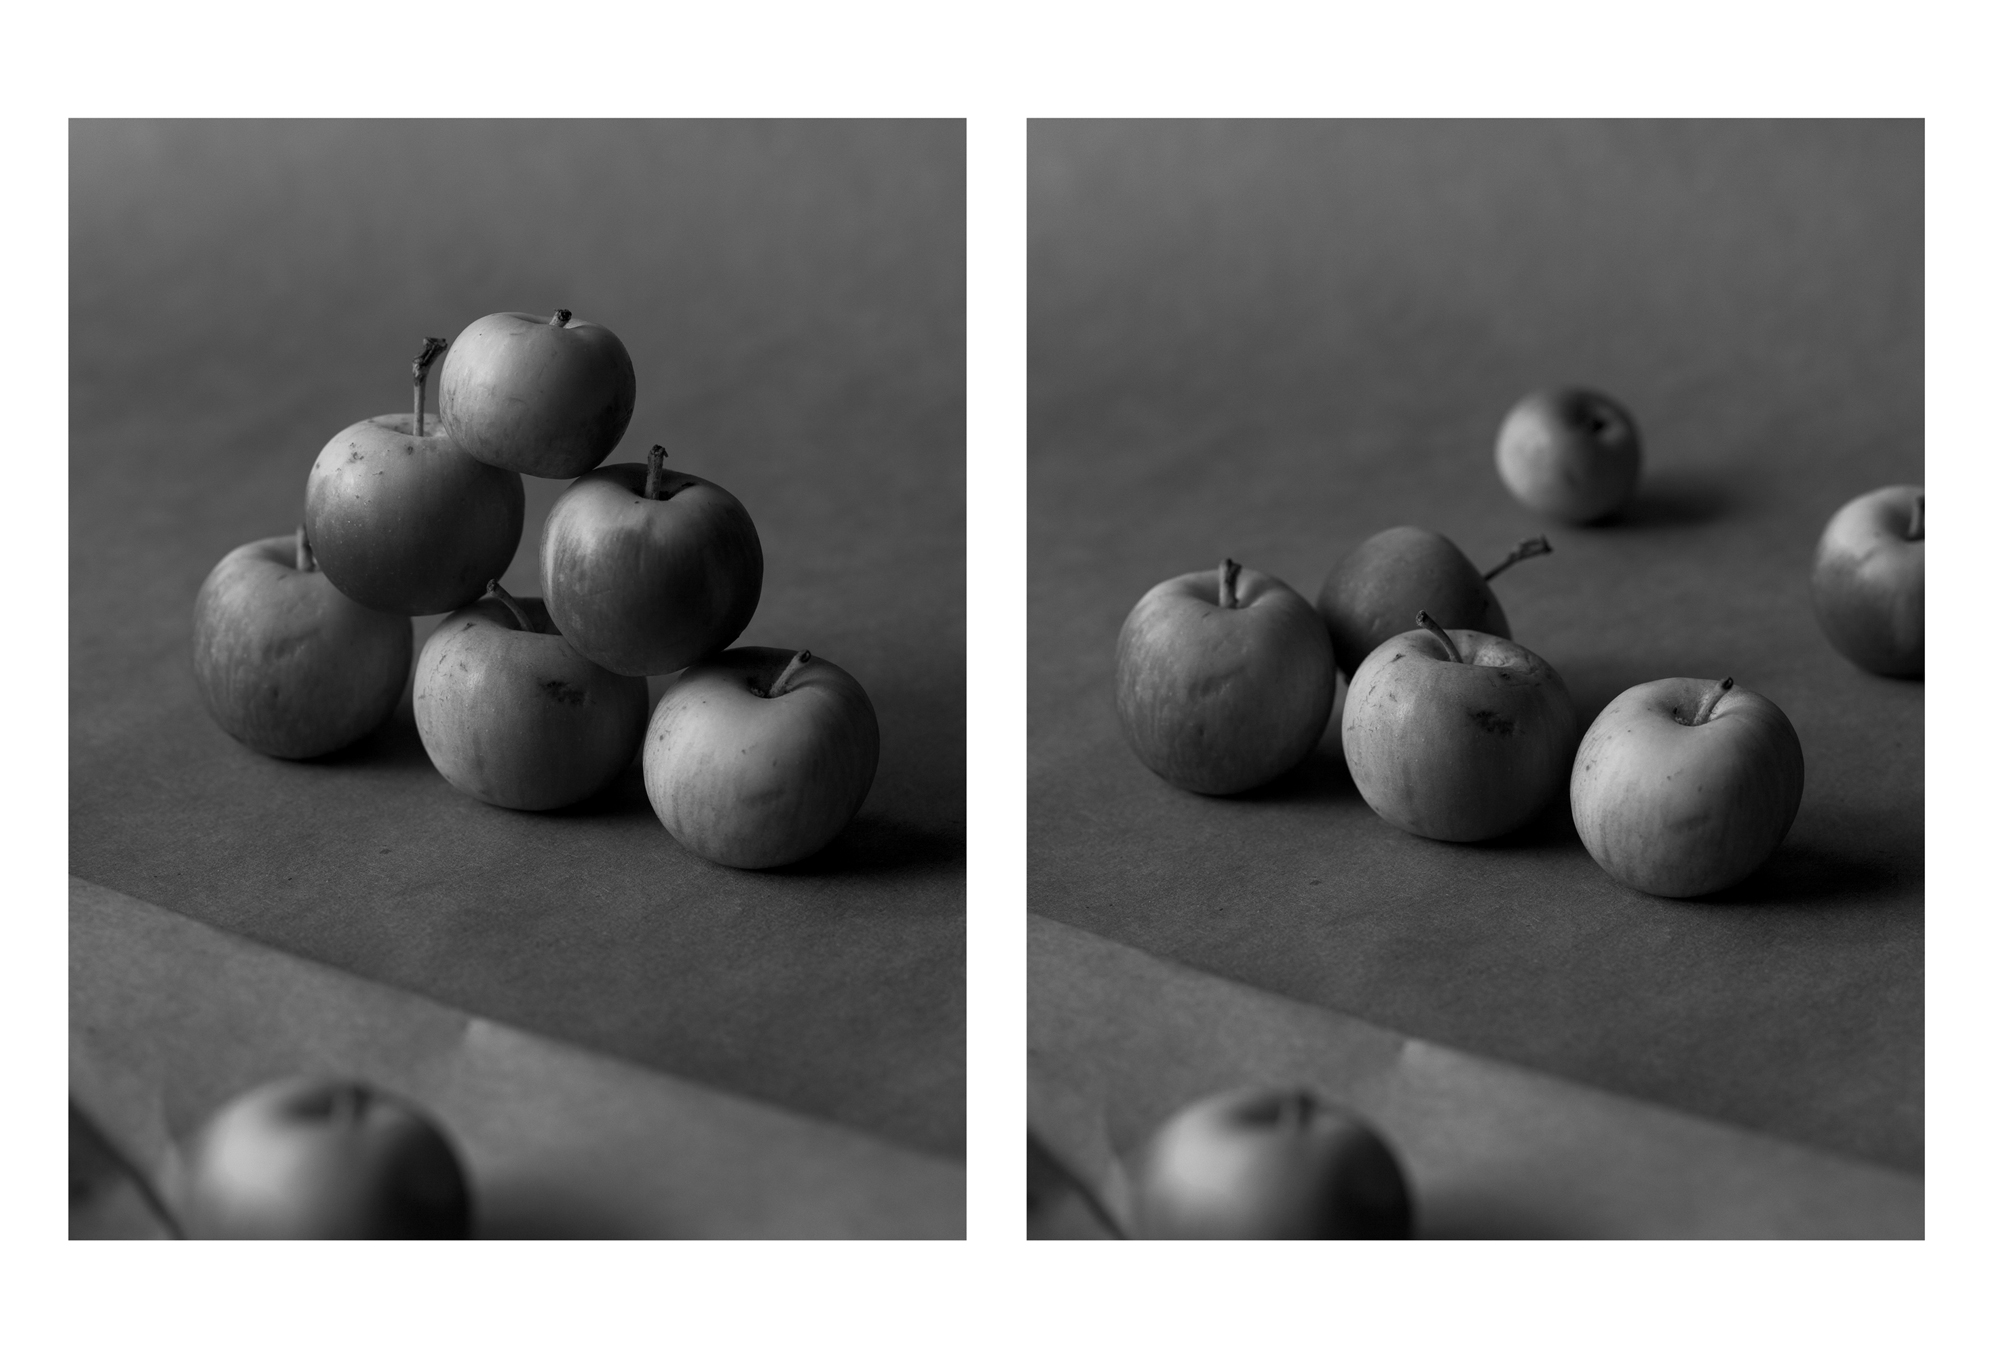 aysia-stieb-foot-tap-jaw-jerk-apples-stack-diptych-photograph-02.jpg